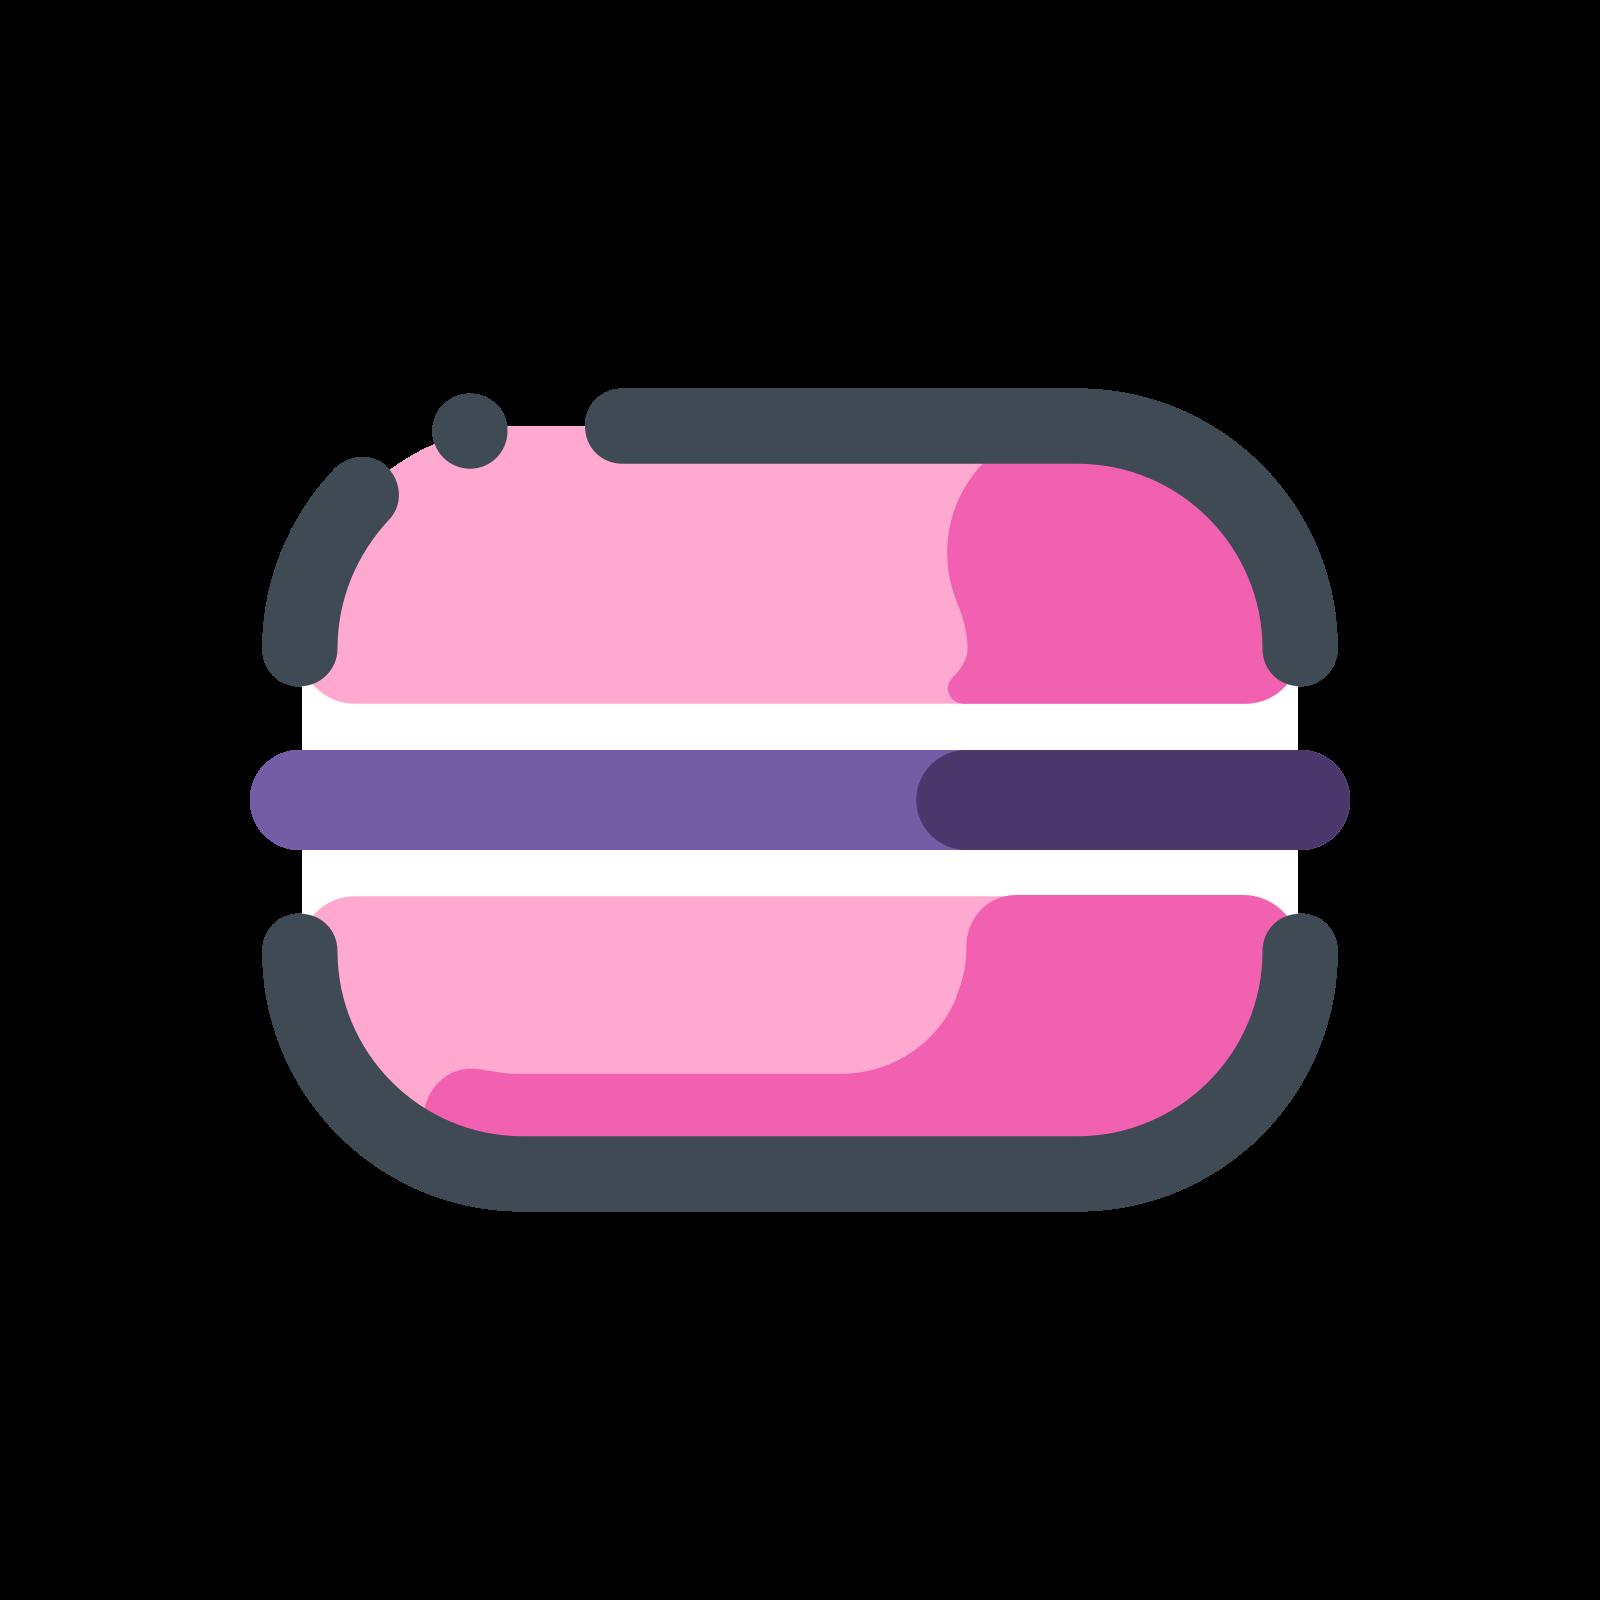 Розовый макарон icon